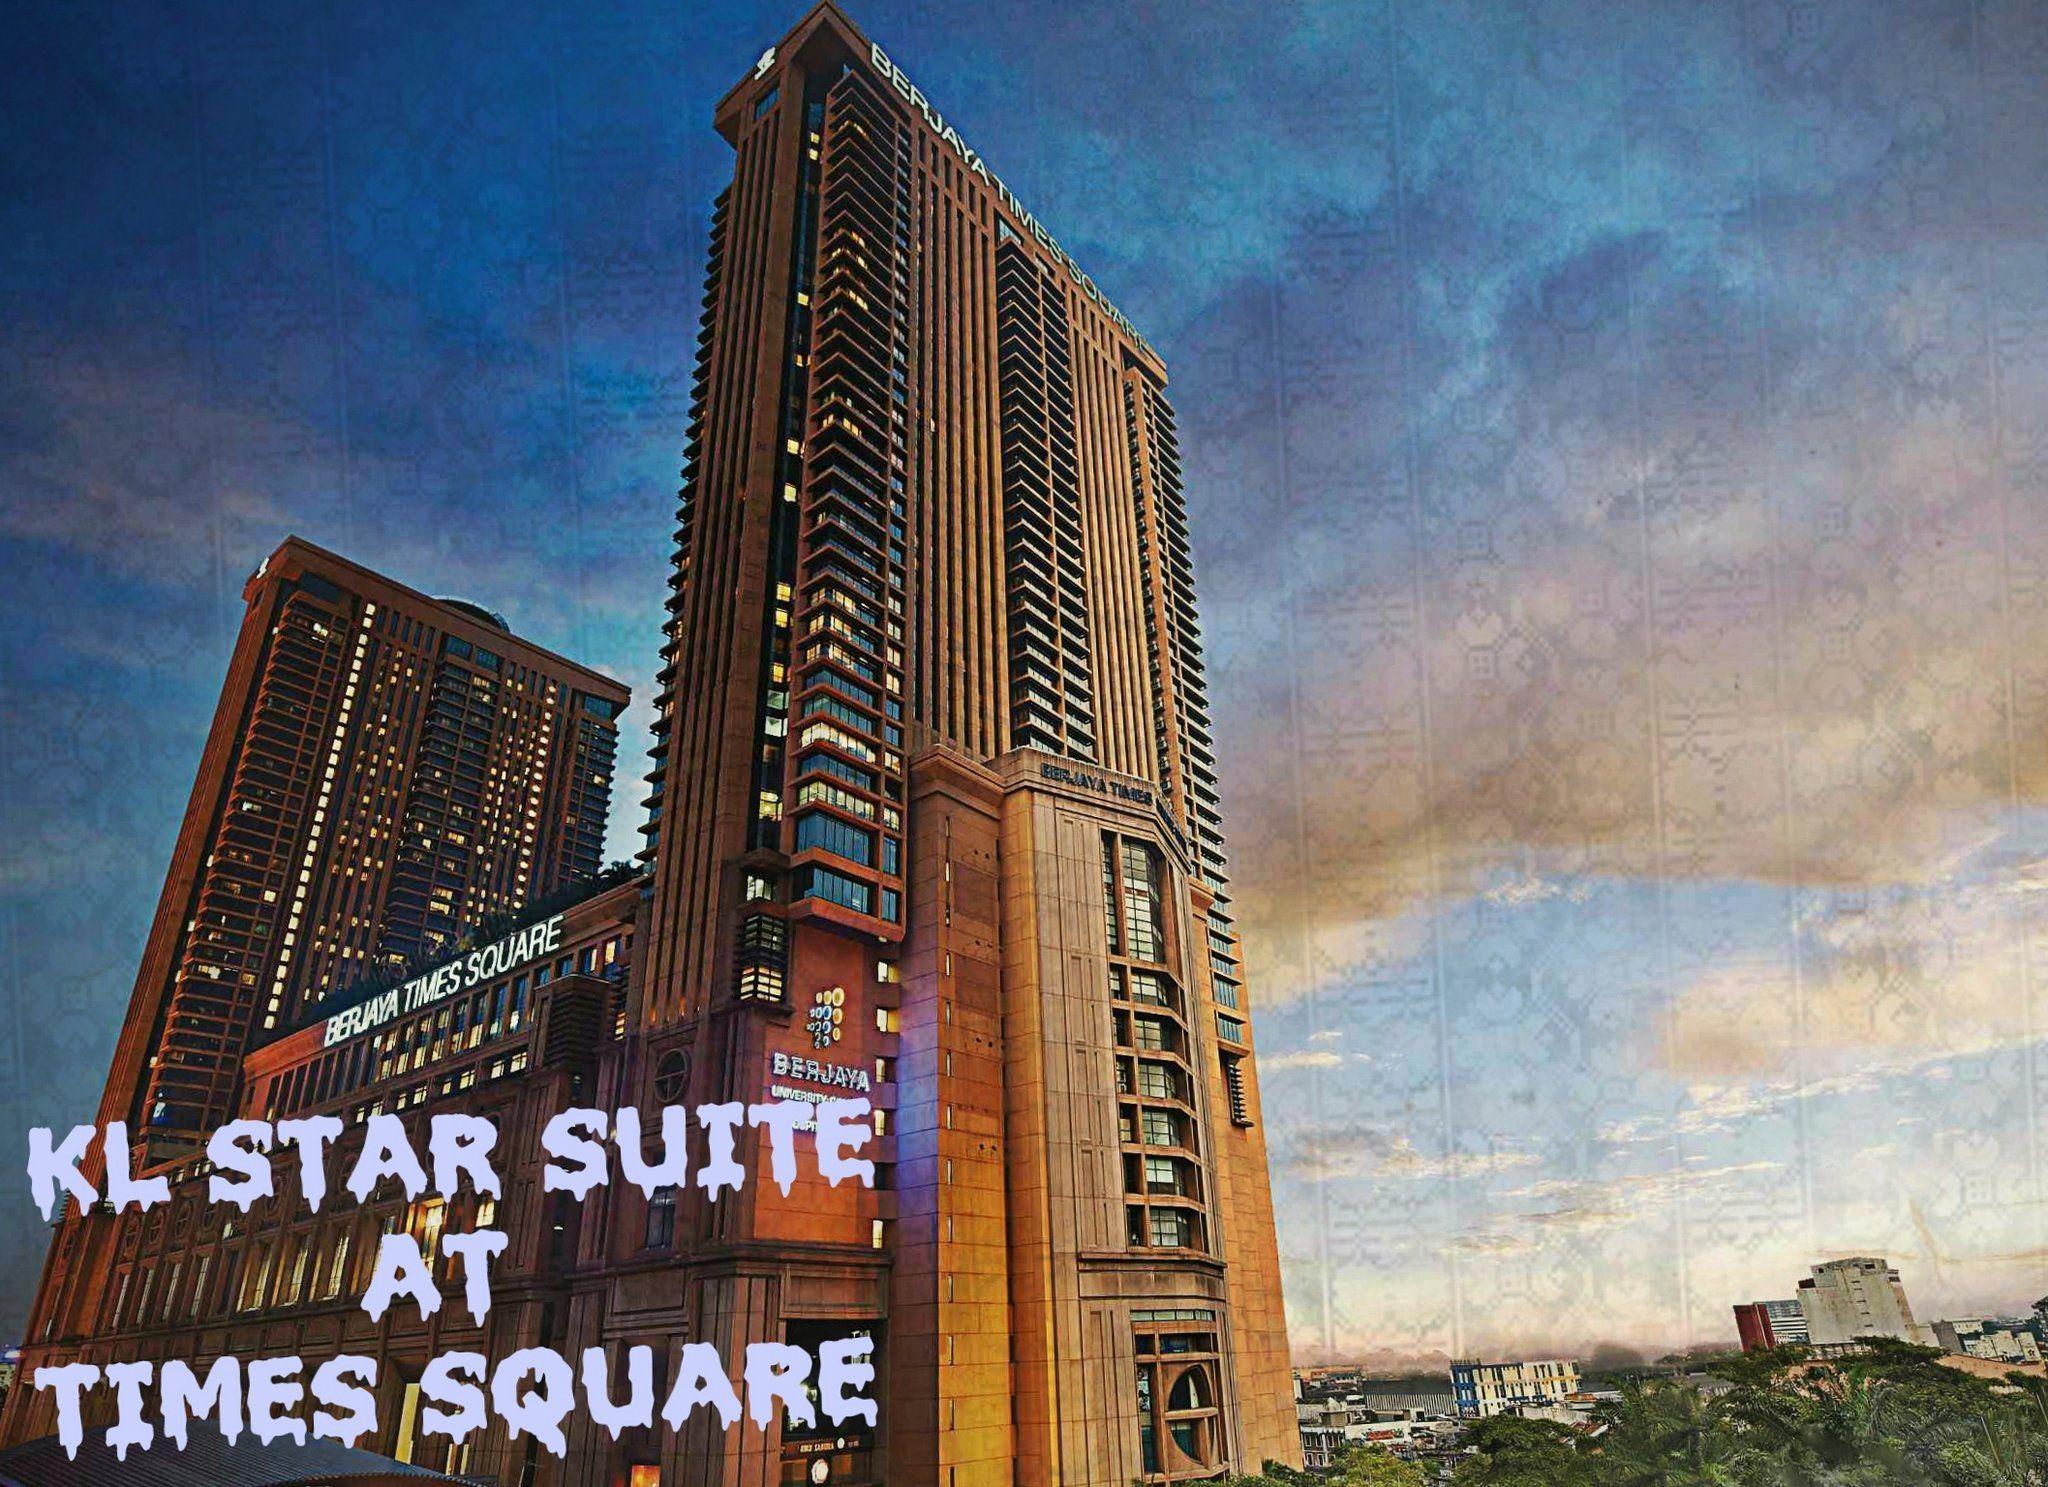 Jannat star suite at times square kuala lumpur malaysia kl kl star suite at times square publicscrutiny Images